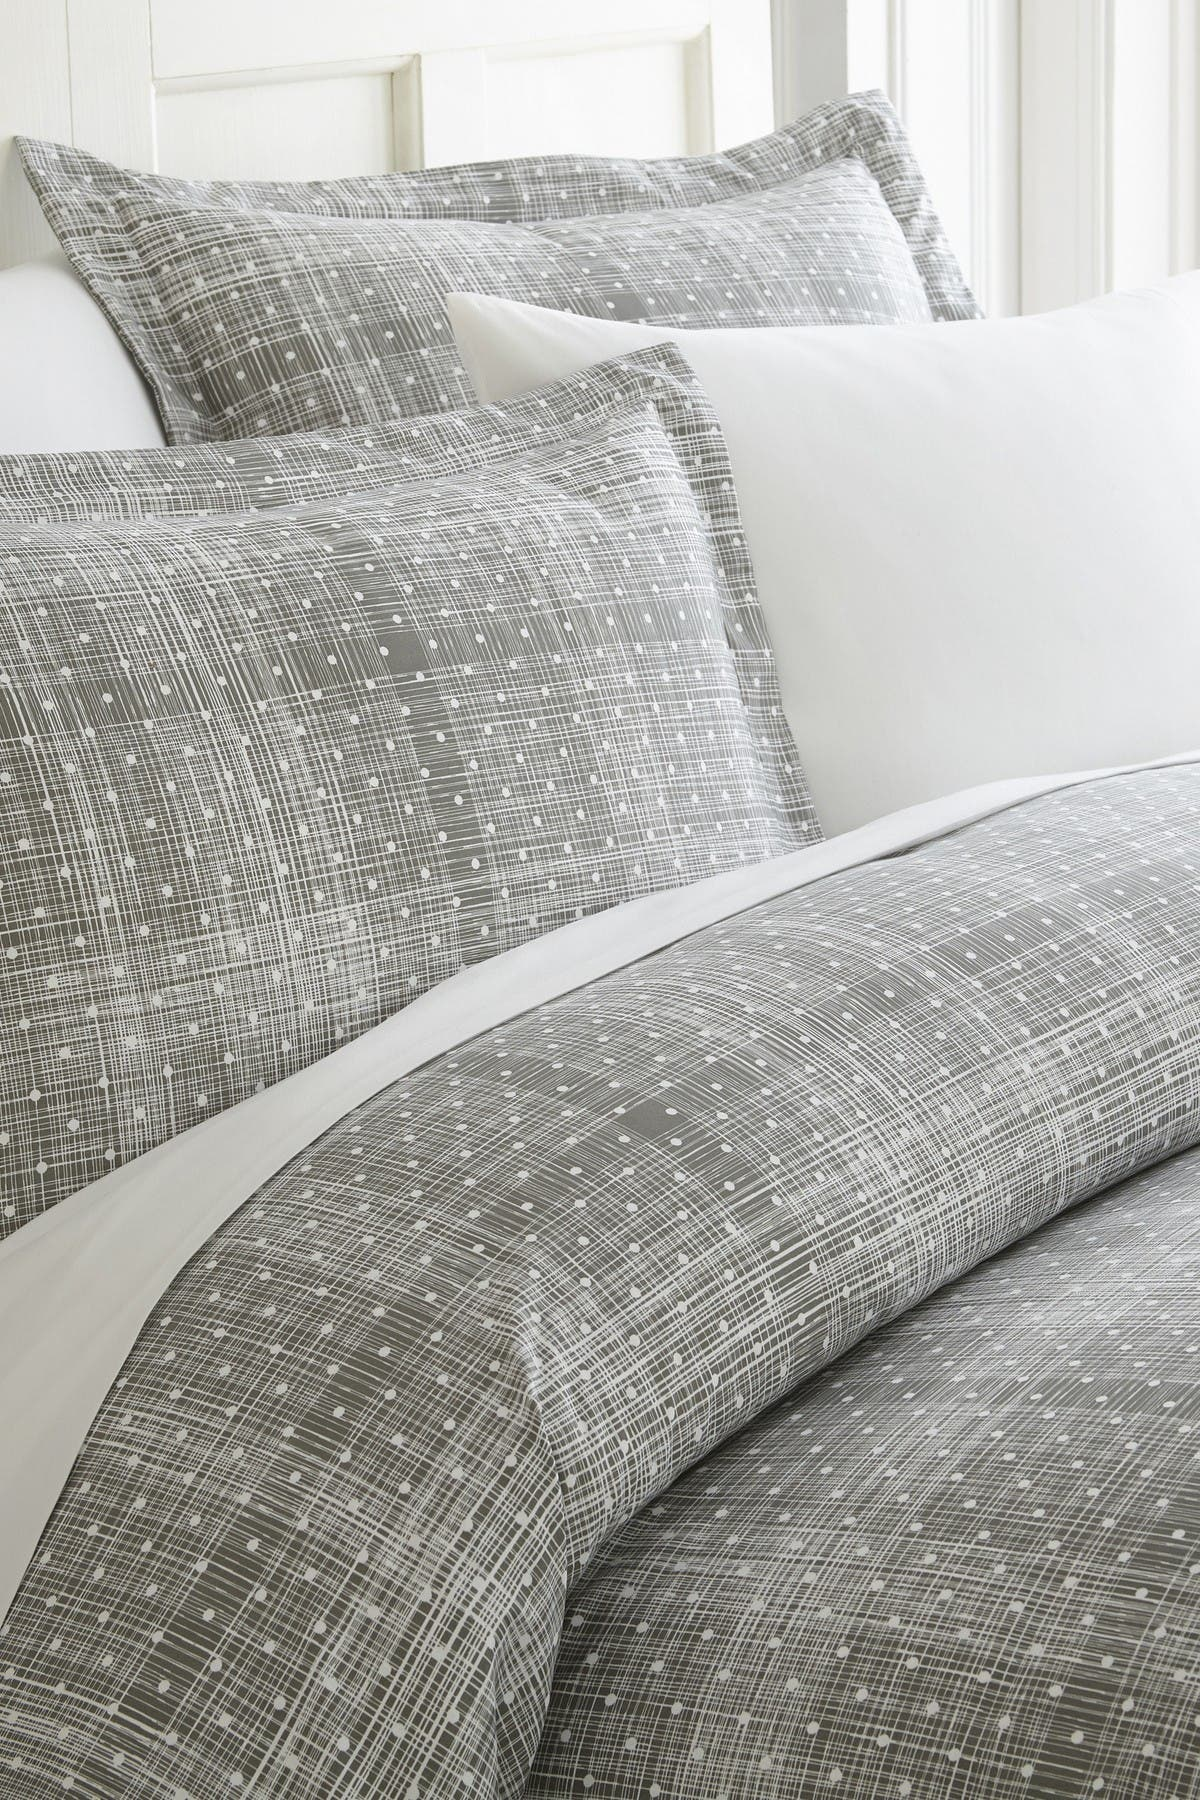 Ienjoy Home Home Spun Premium Ultra Soft Polka Dot Pattern 3 Piece Duvet Cover King Set Gray Nordstrom Rack